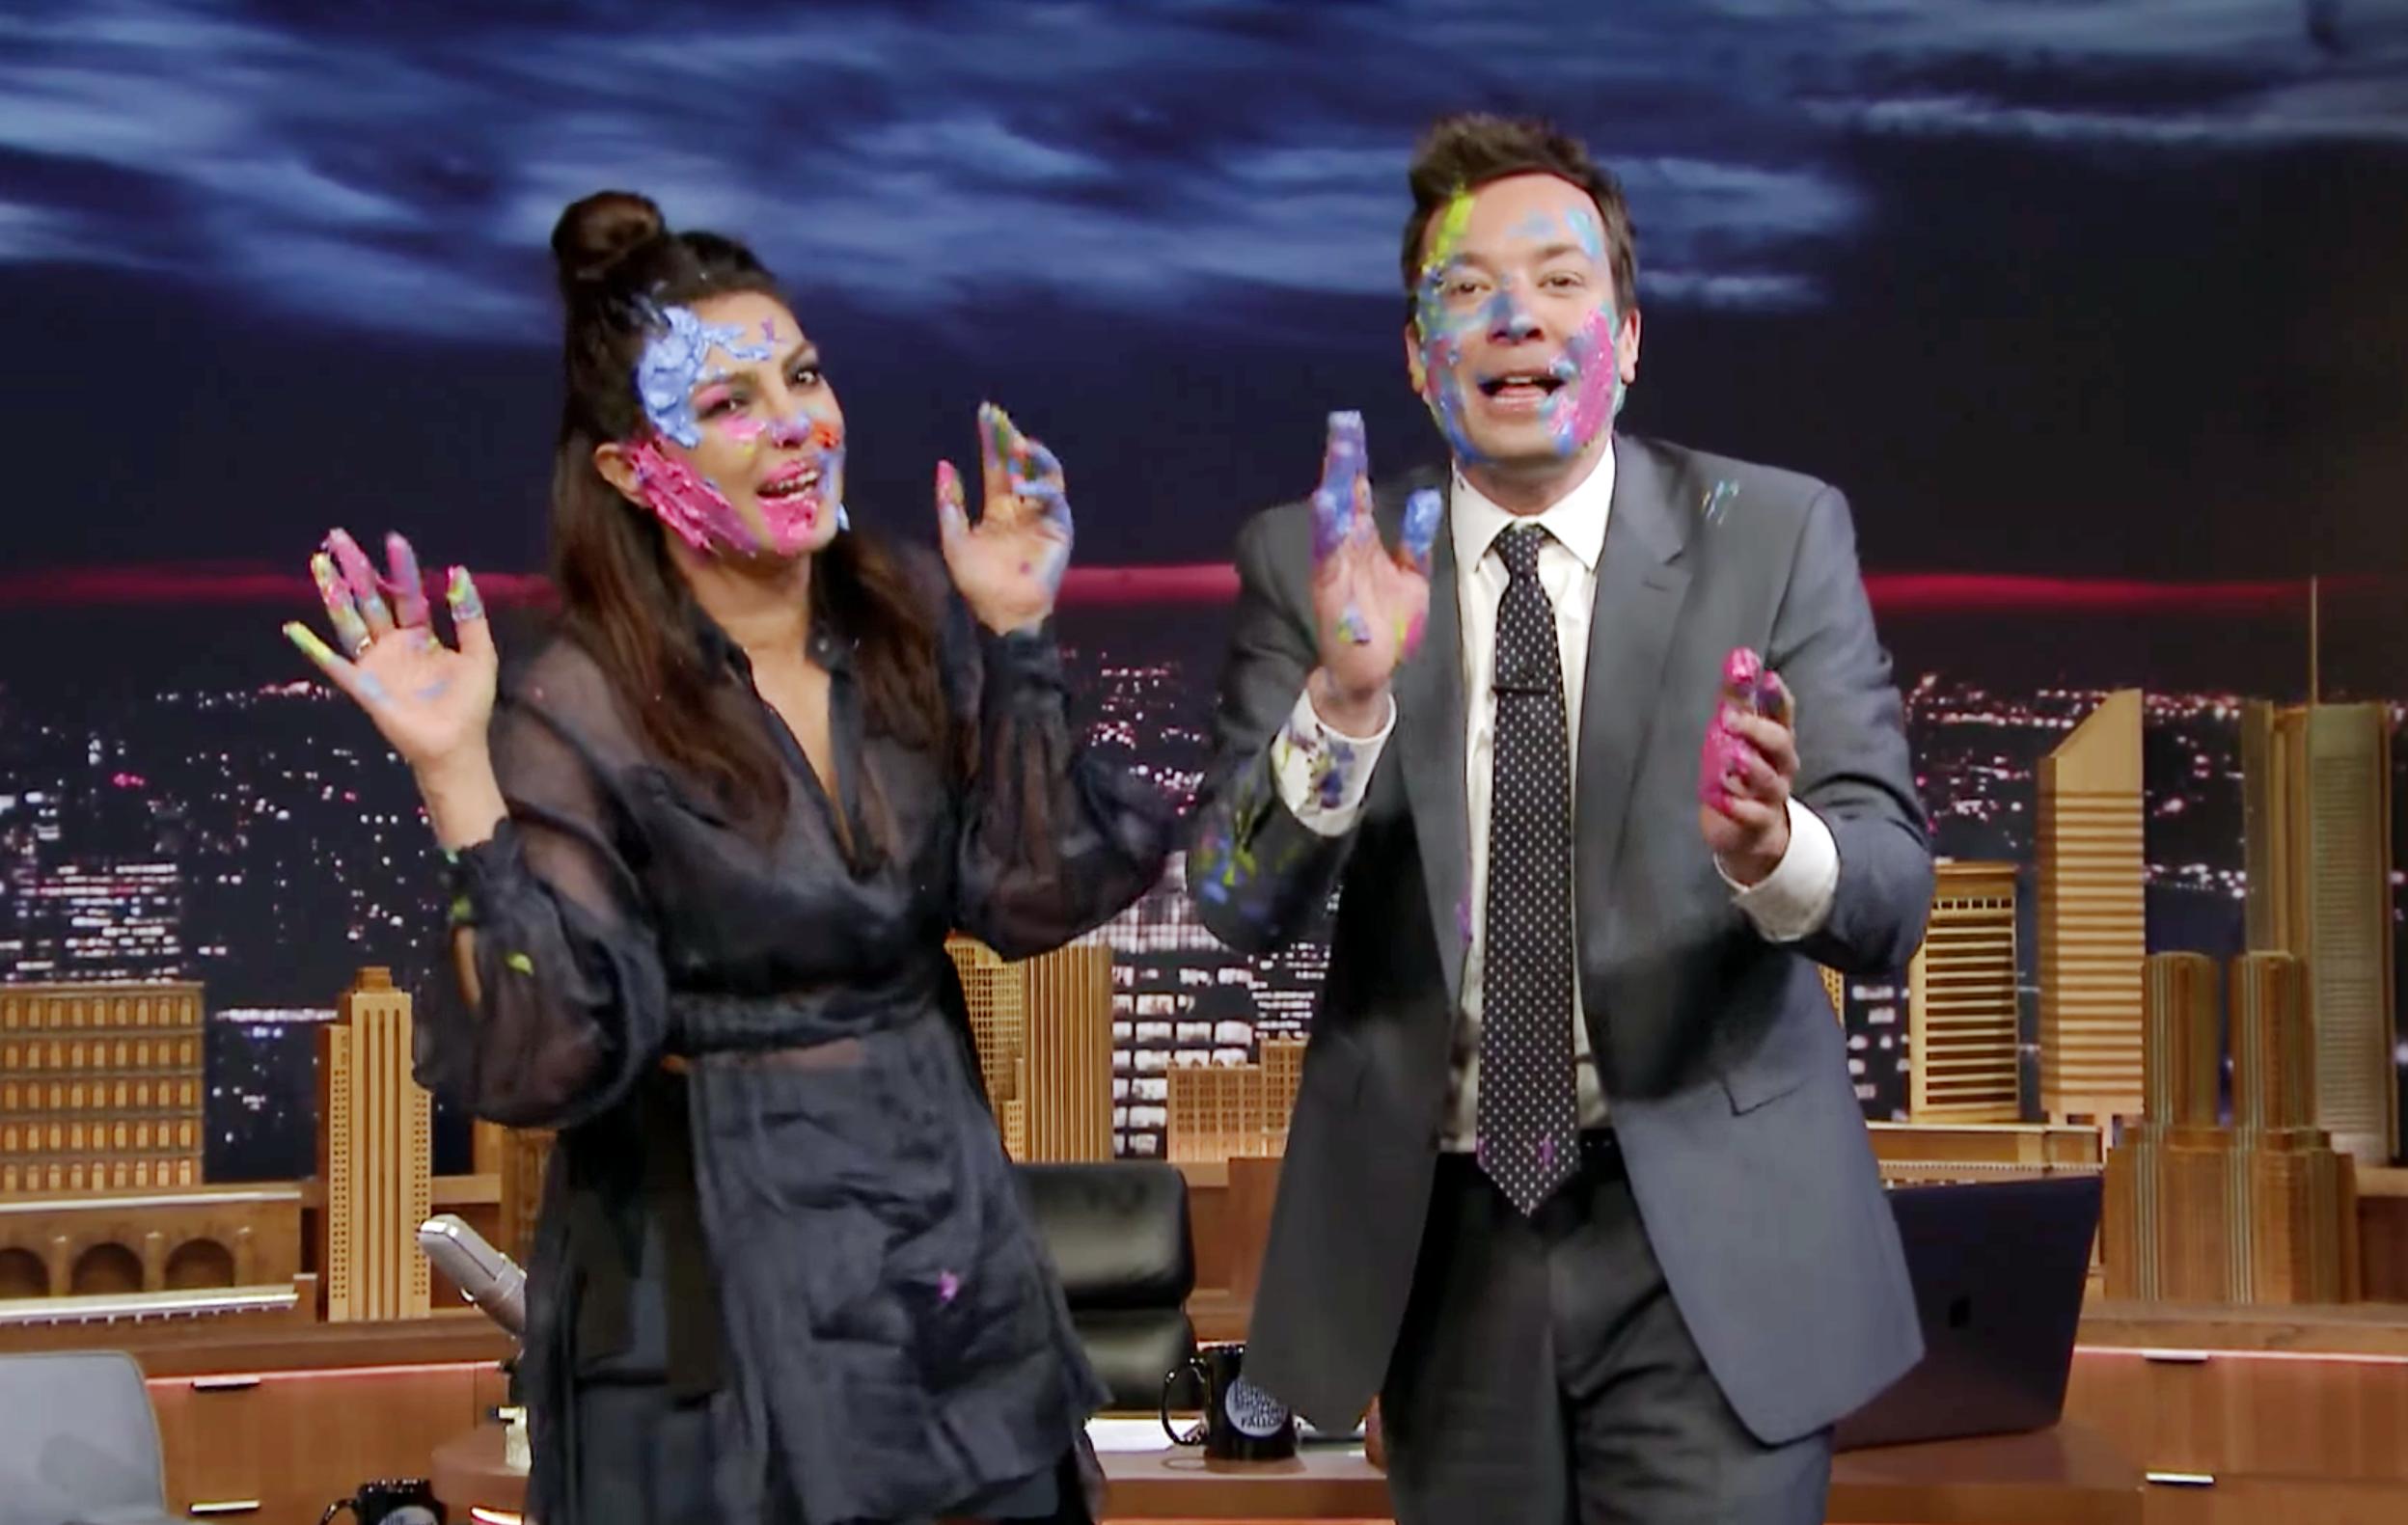 Priyanka Chopra and Jimmy Fallon play Holi on Fallon Tonight. Courtesy: Fallon Tonight